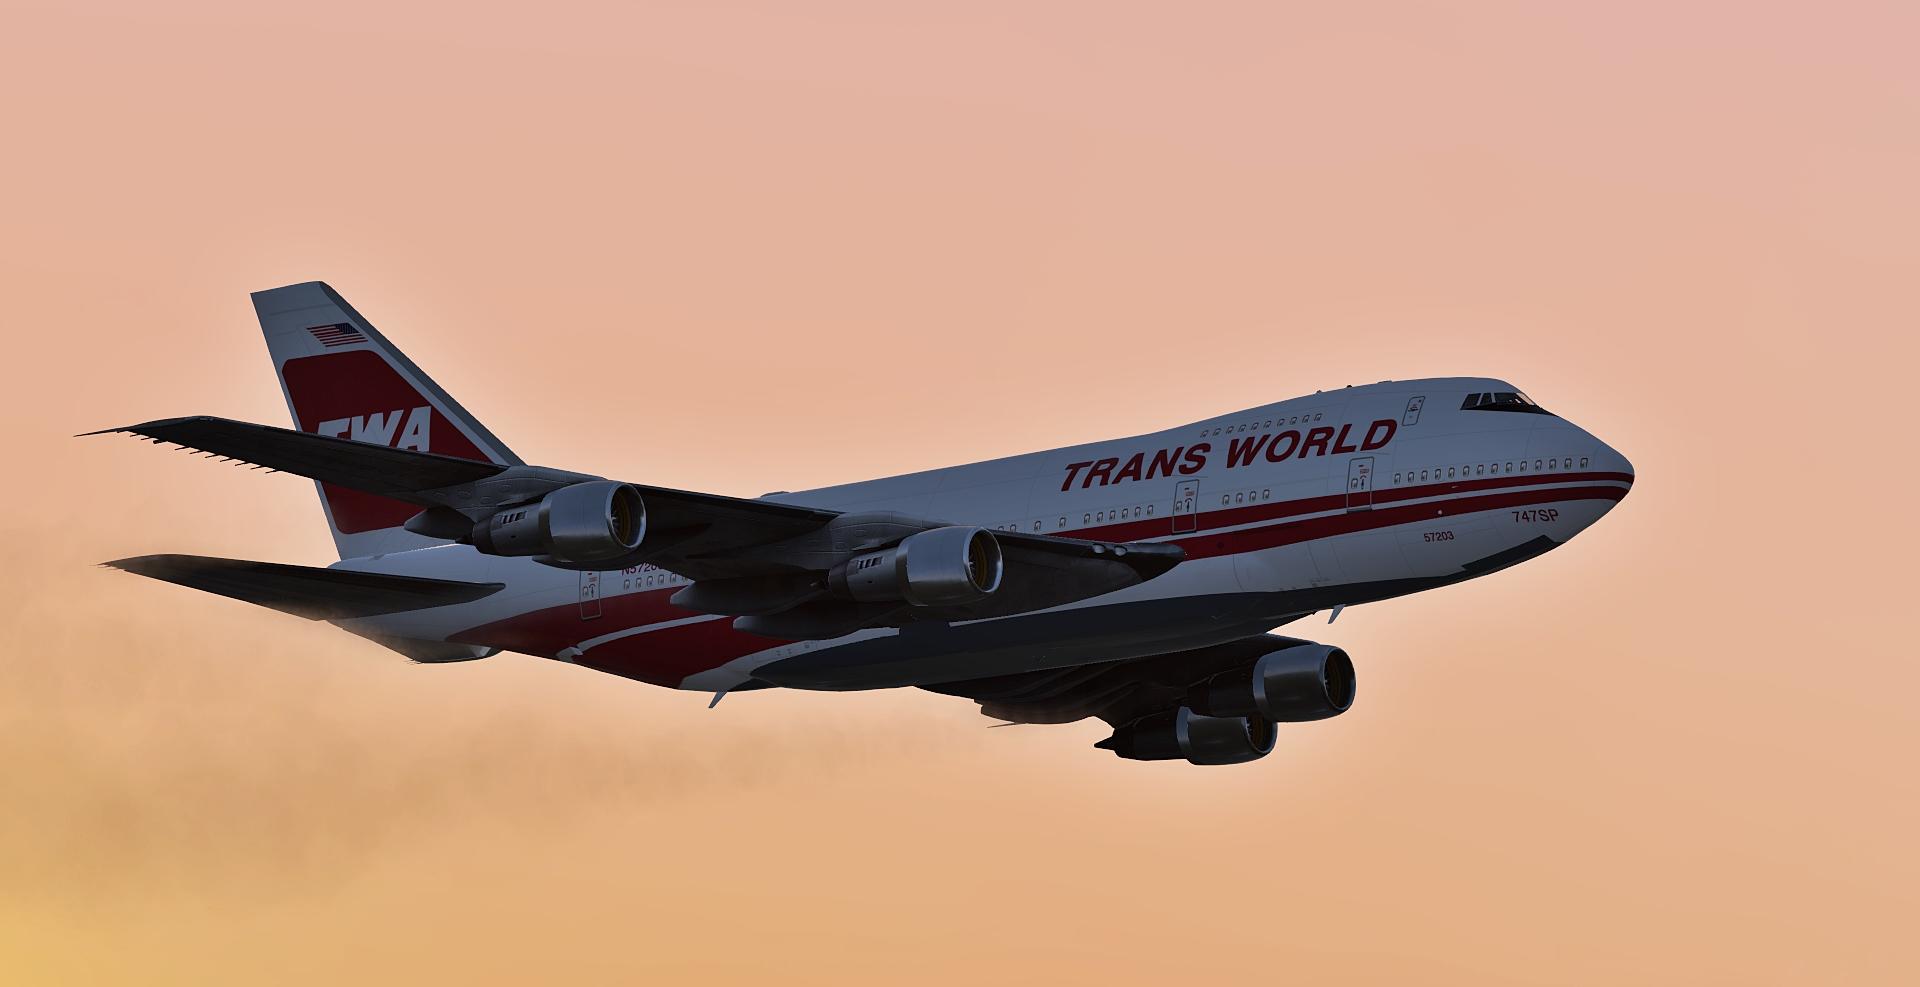 747sp17ykqx.jpg